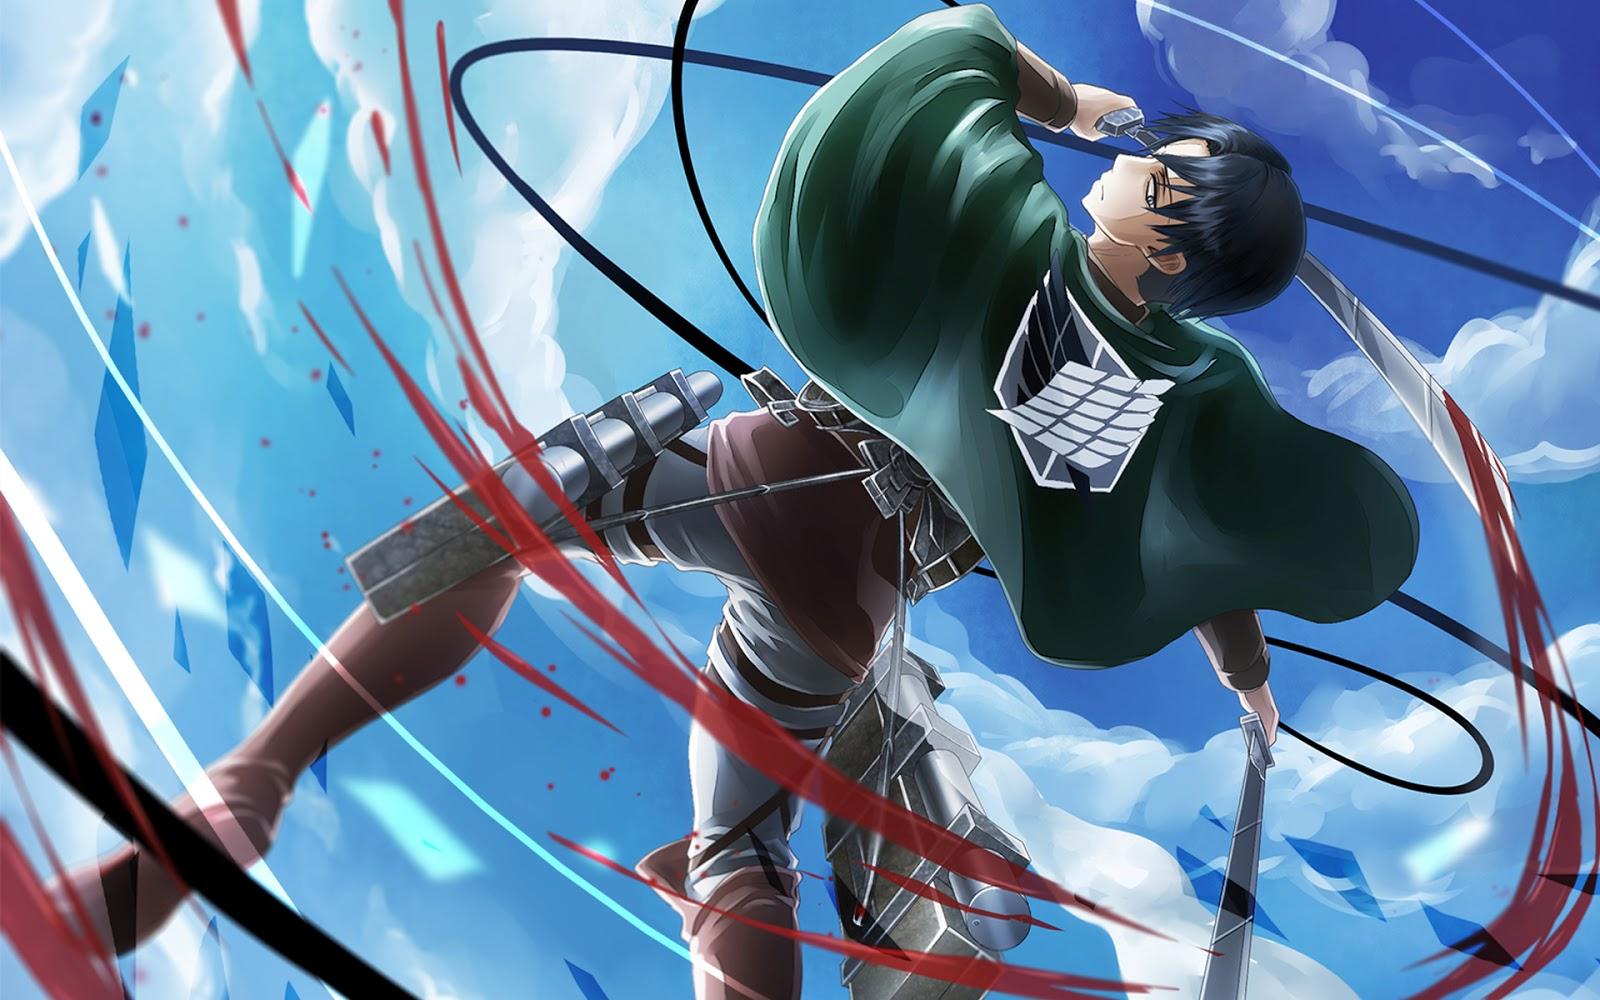 Attack on Titan Shingeki no Kyojin Anime Wallpaper HD e05 Scarf Clouds 1600x1000